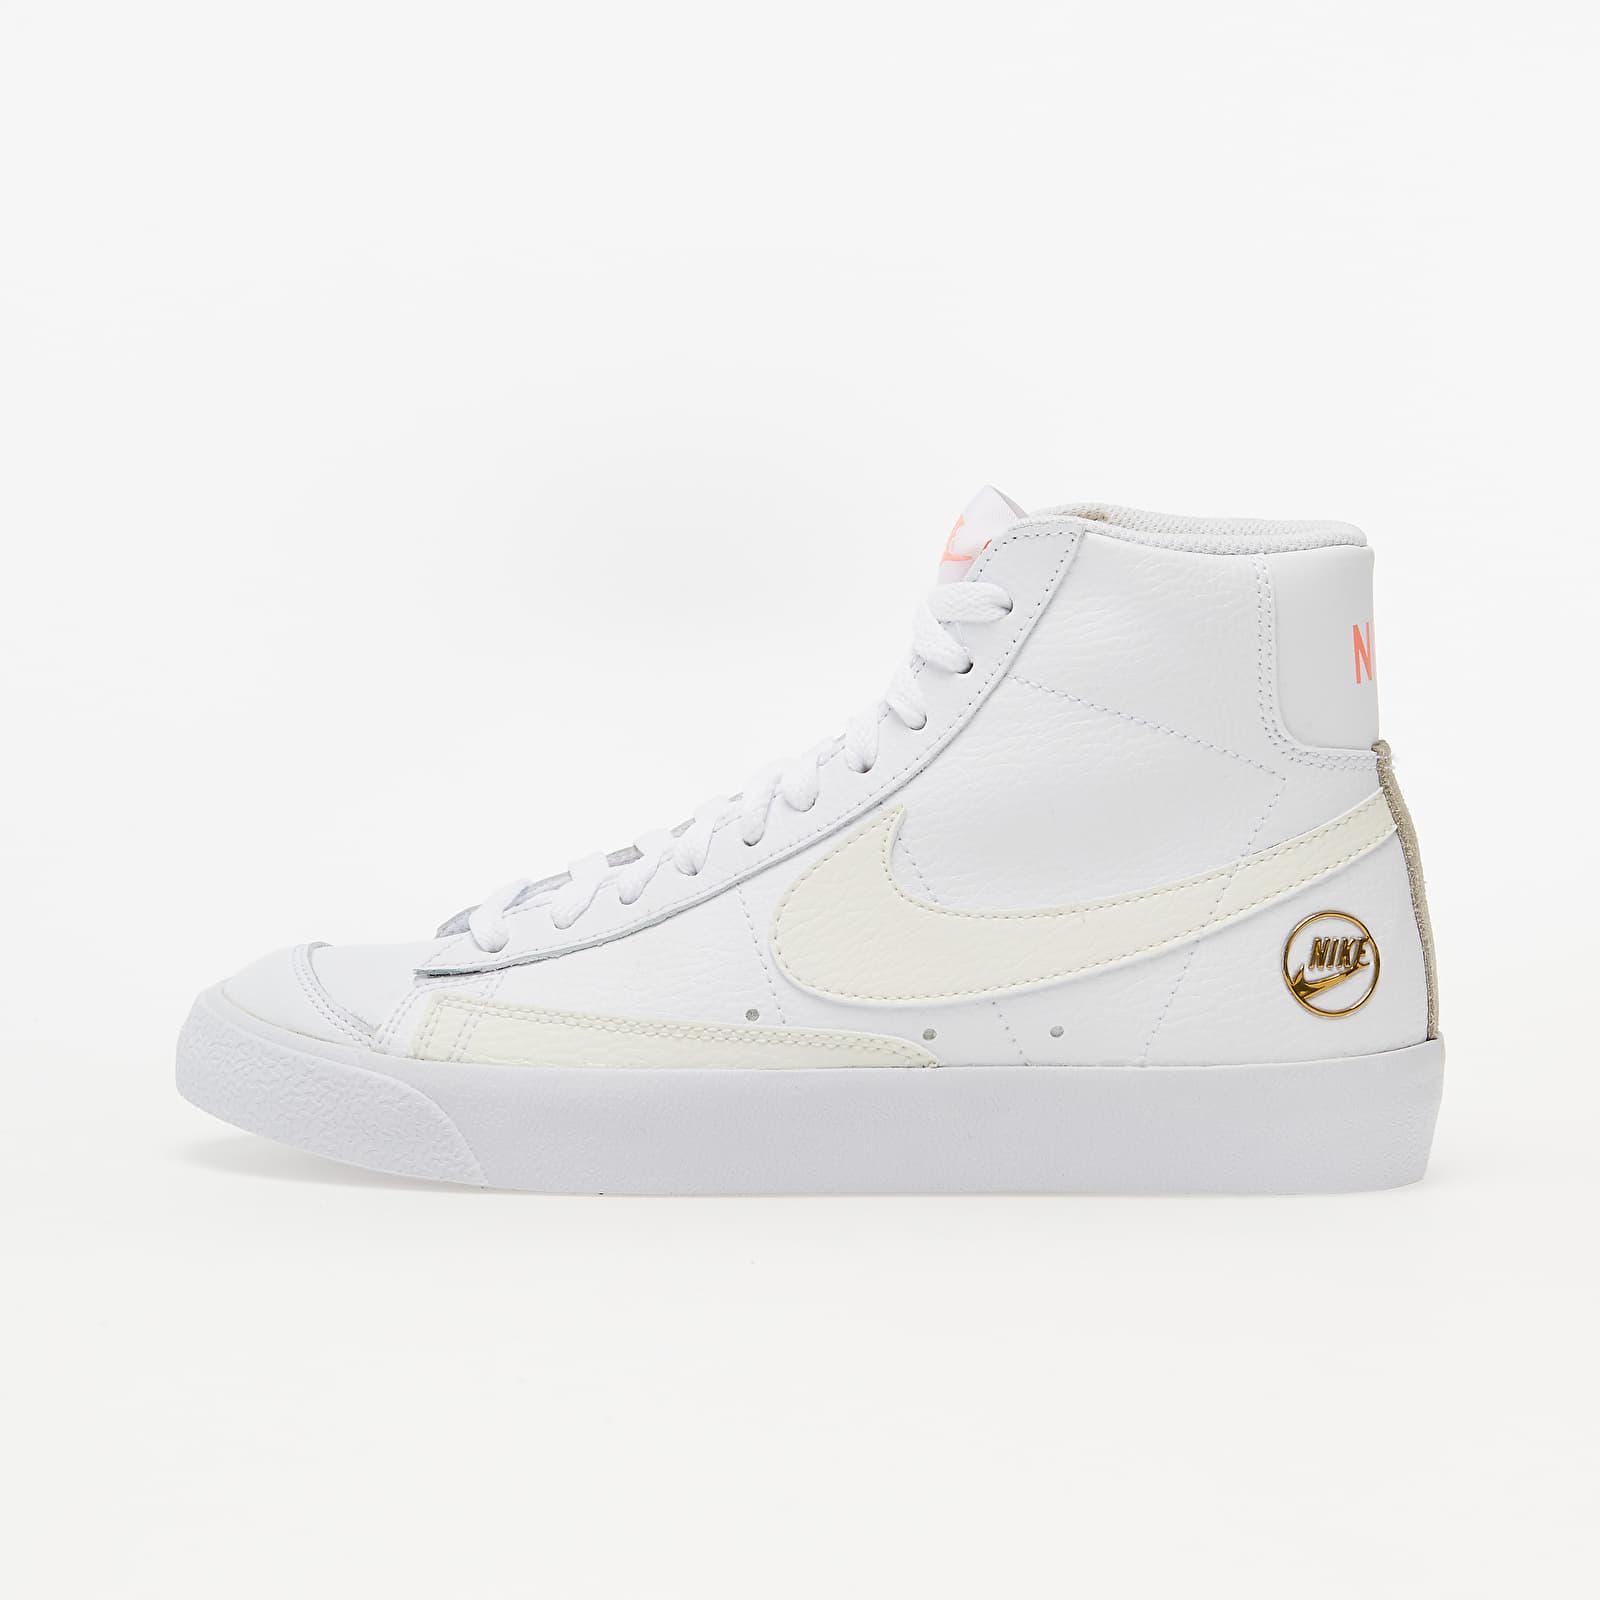 Zapatillas mujer Nike W Blazer Mid Vintage '77 White/ Sail-Metallic Gold-Atomic Pink